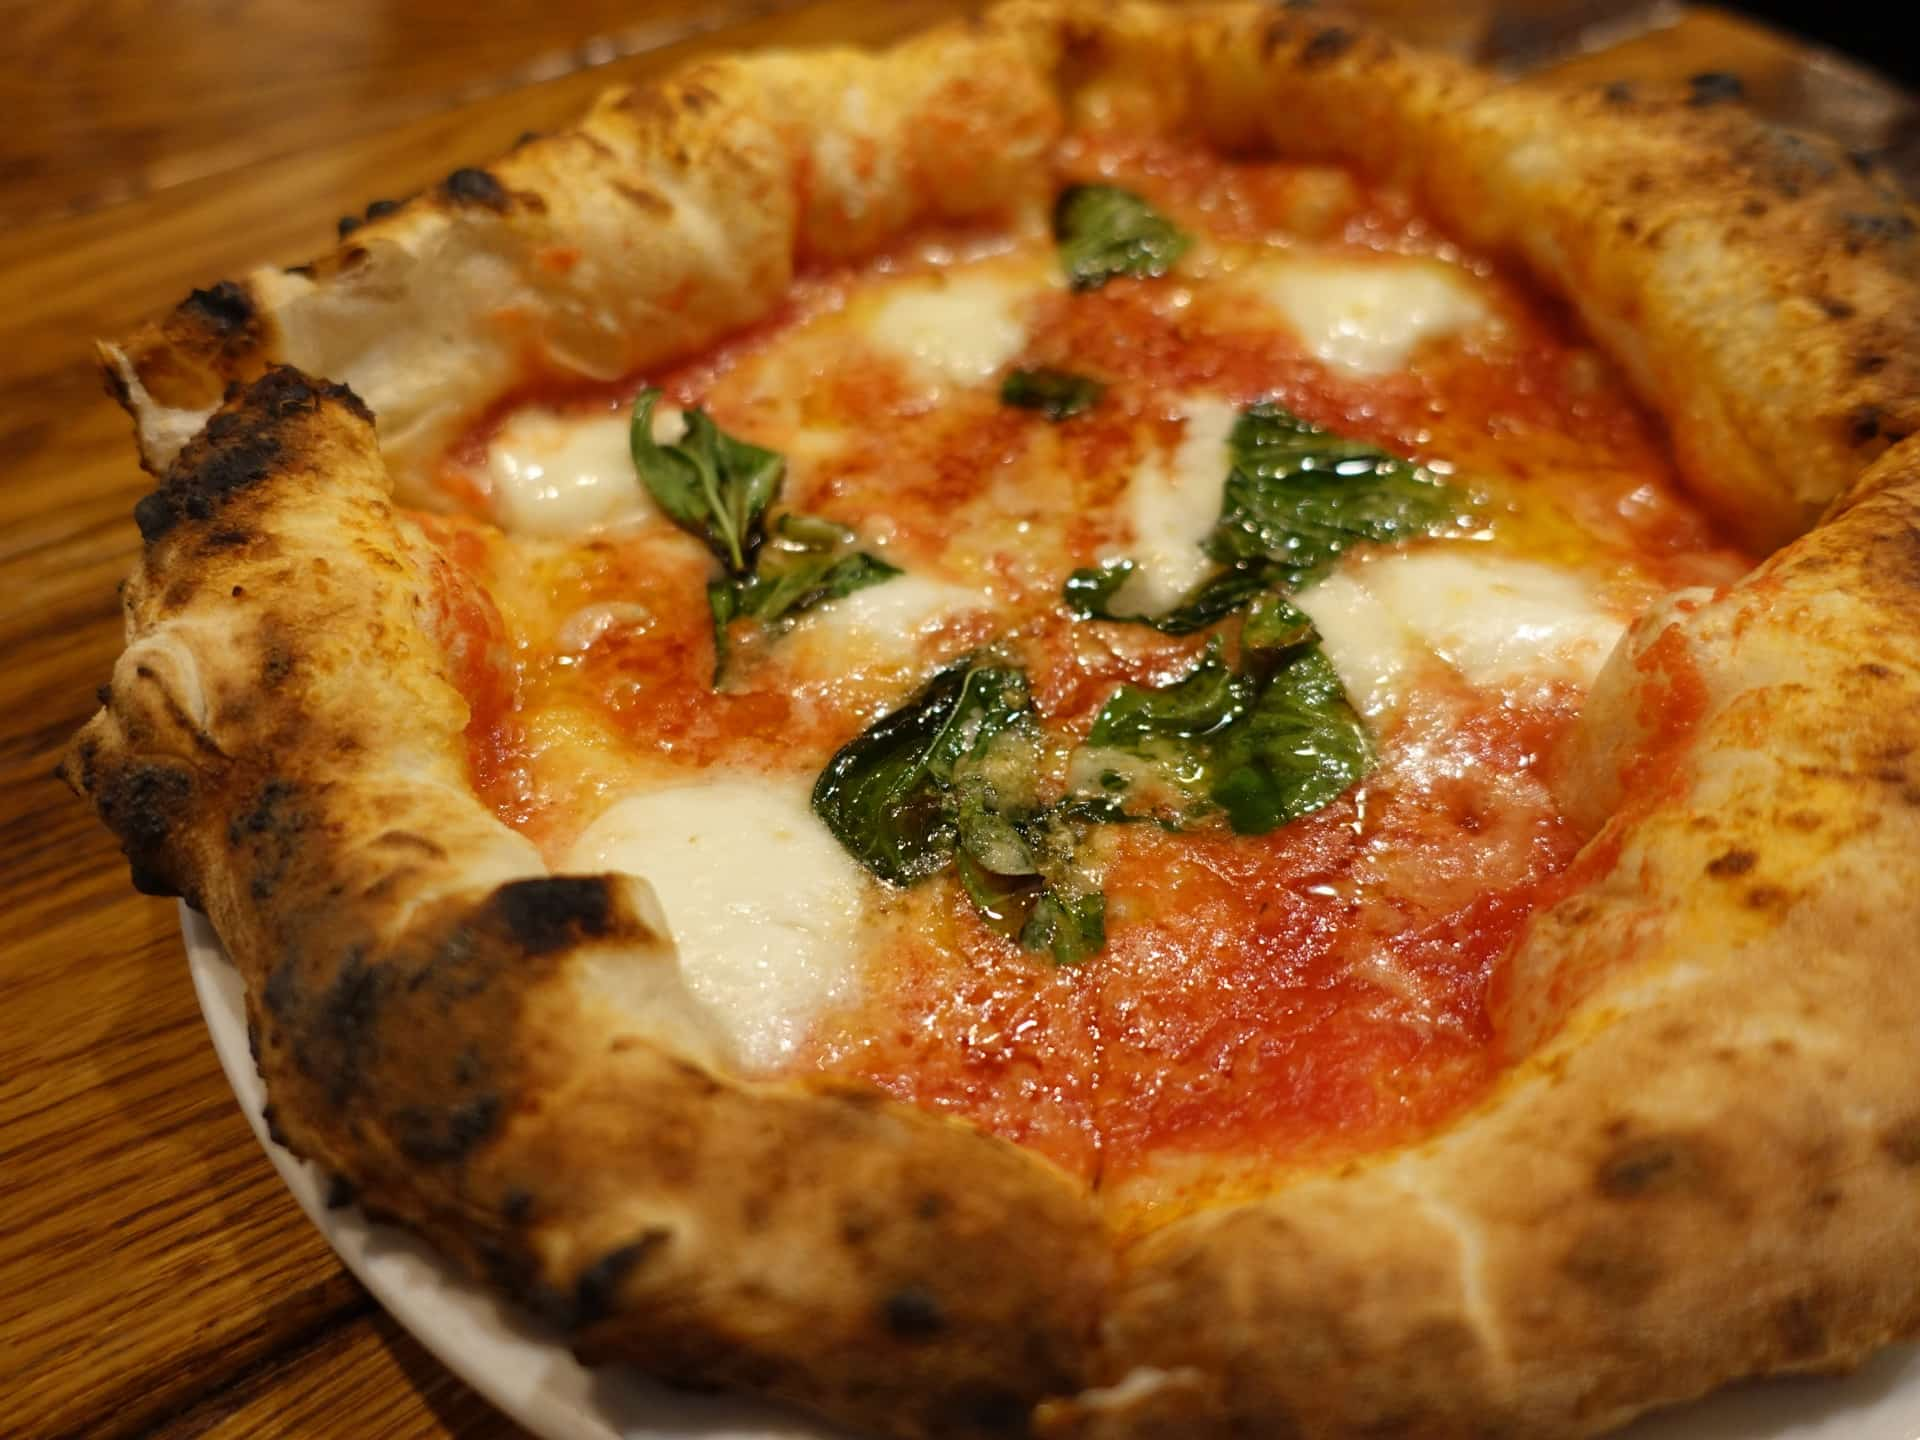 quarto(クアルト) − 神戸・三宮の絶品ピザ。平日限定のランチメニューはお得